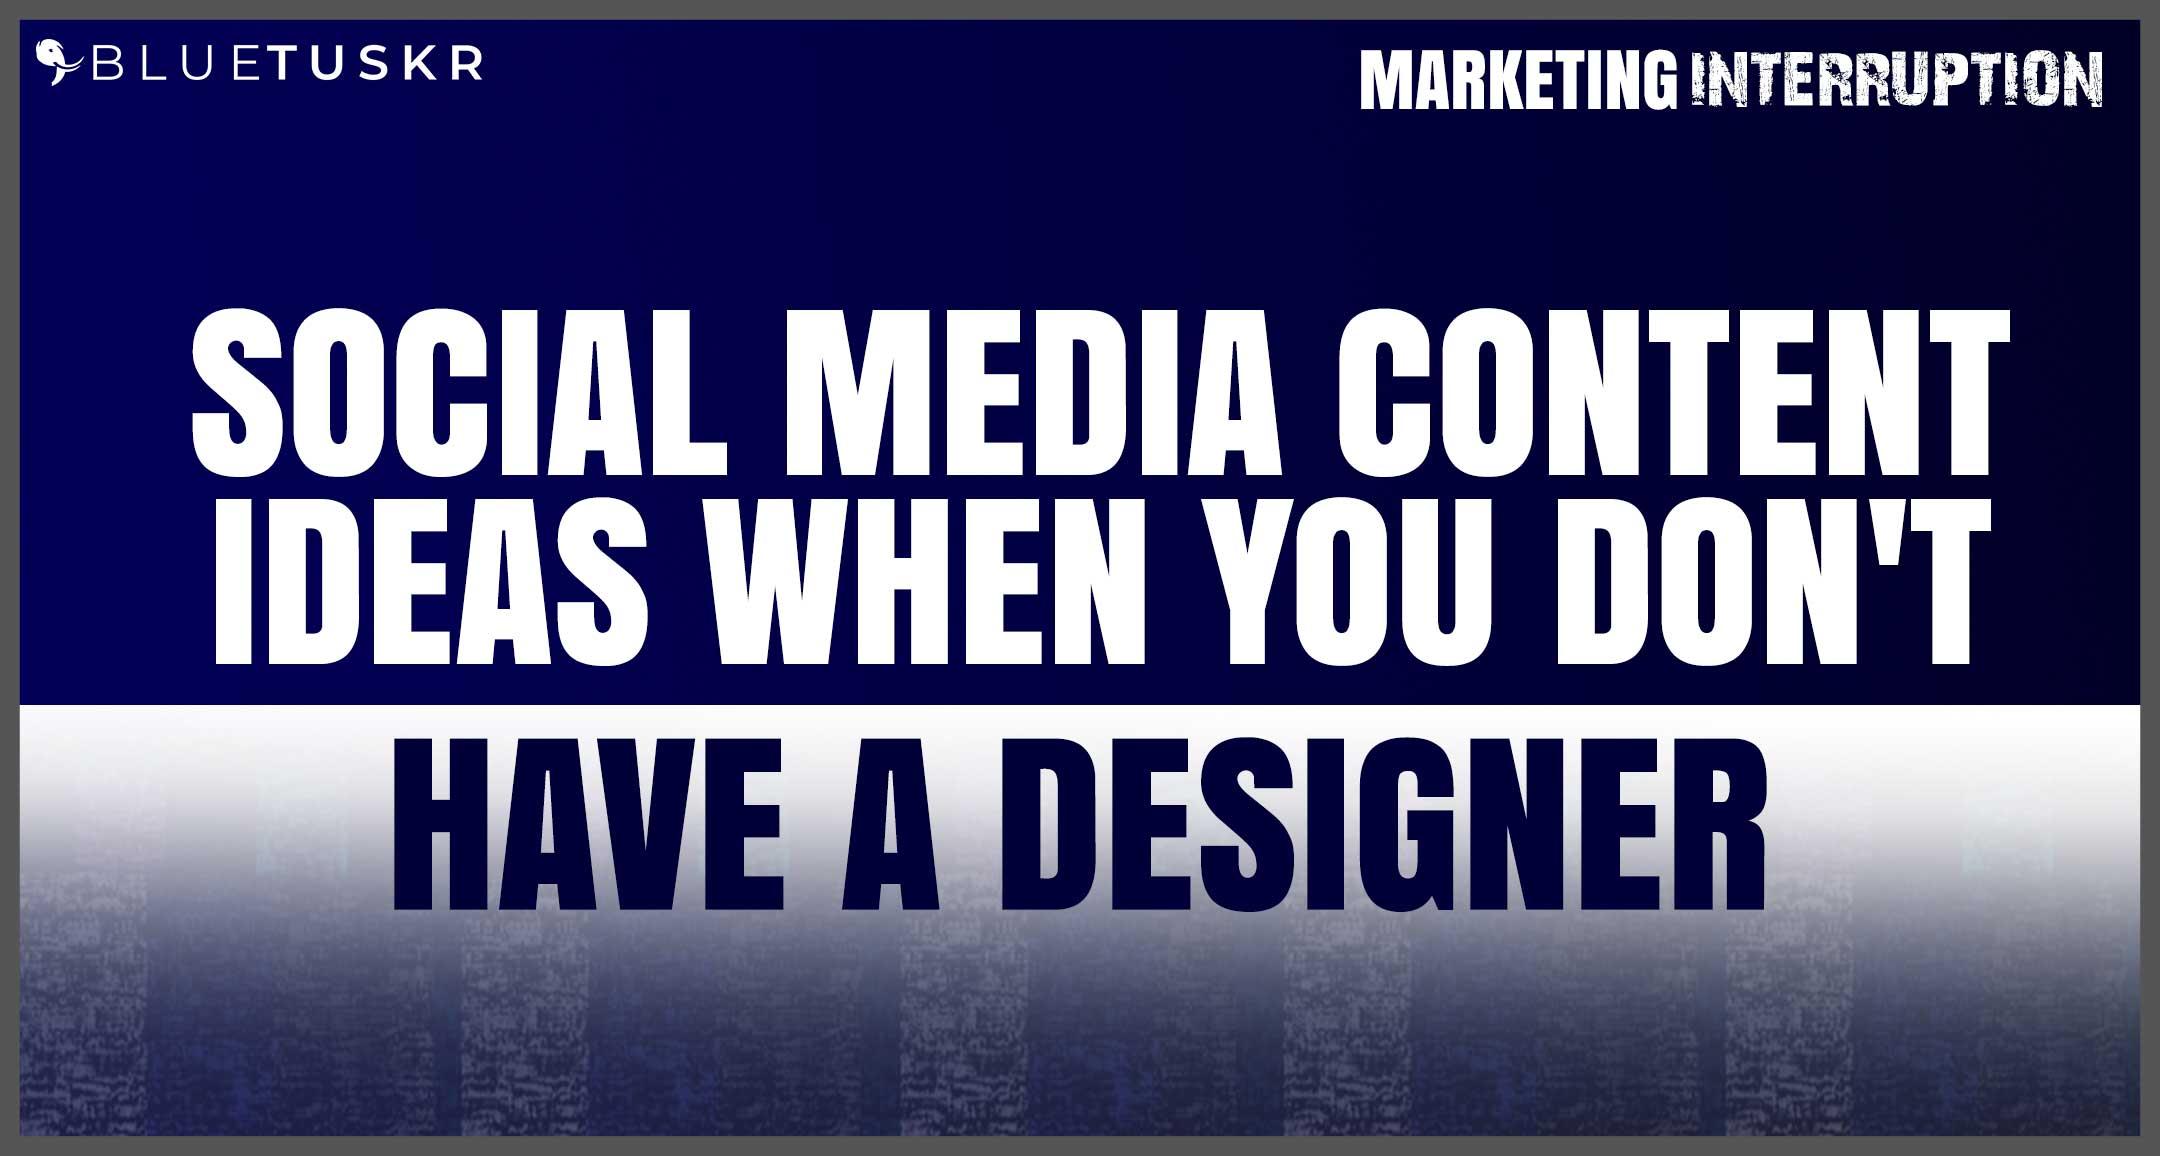 Social Media Content Ideas When You Don't Have a Designer